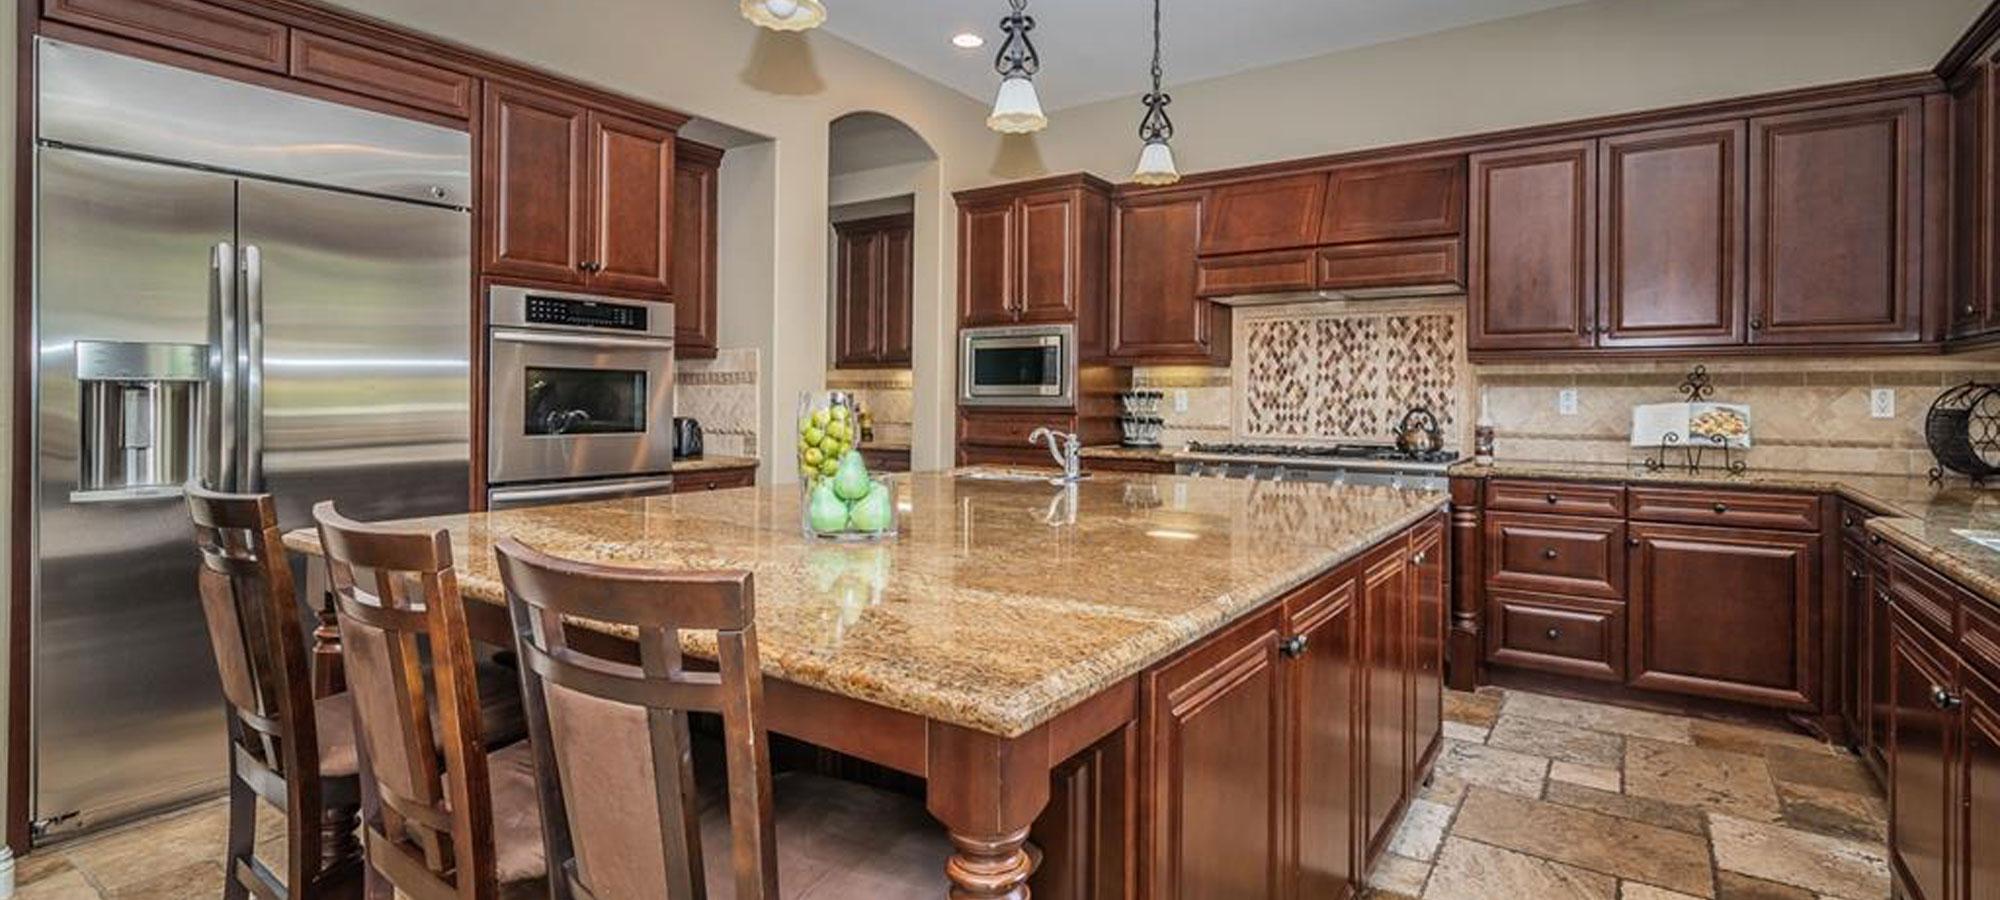 16368 Winecreek Rd San Diego, CA 92127